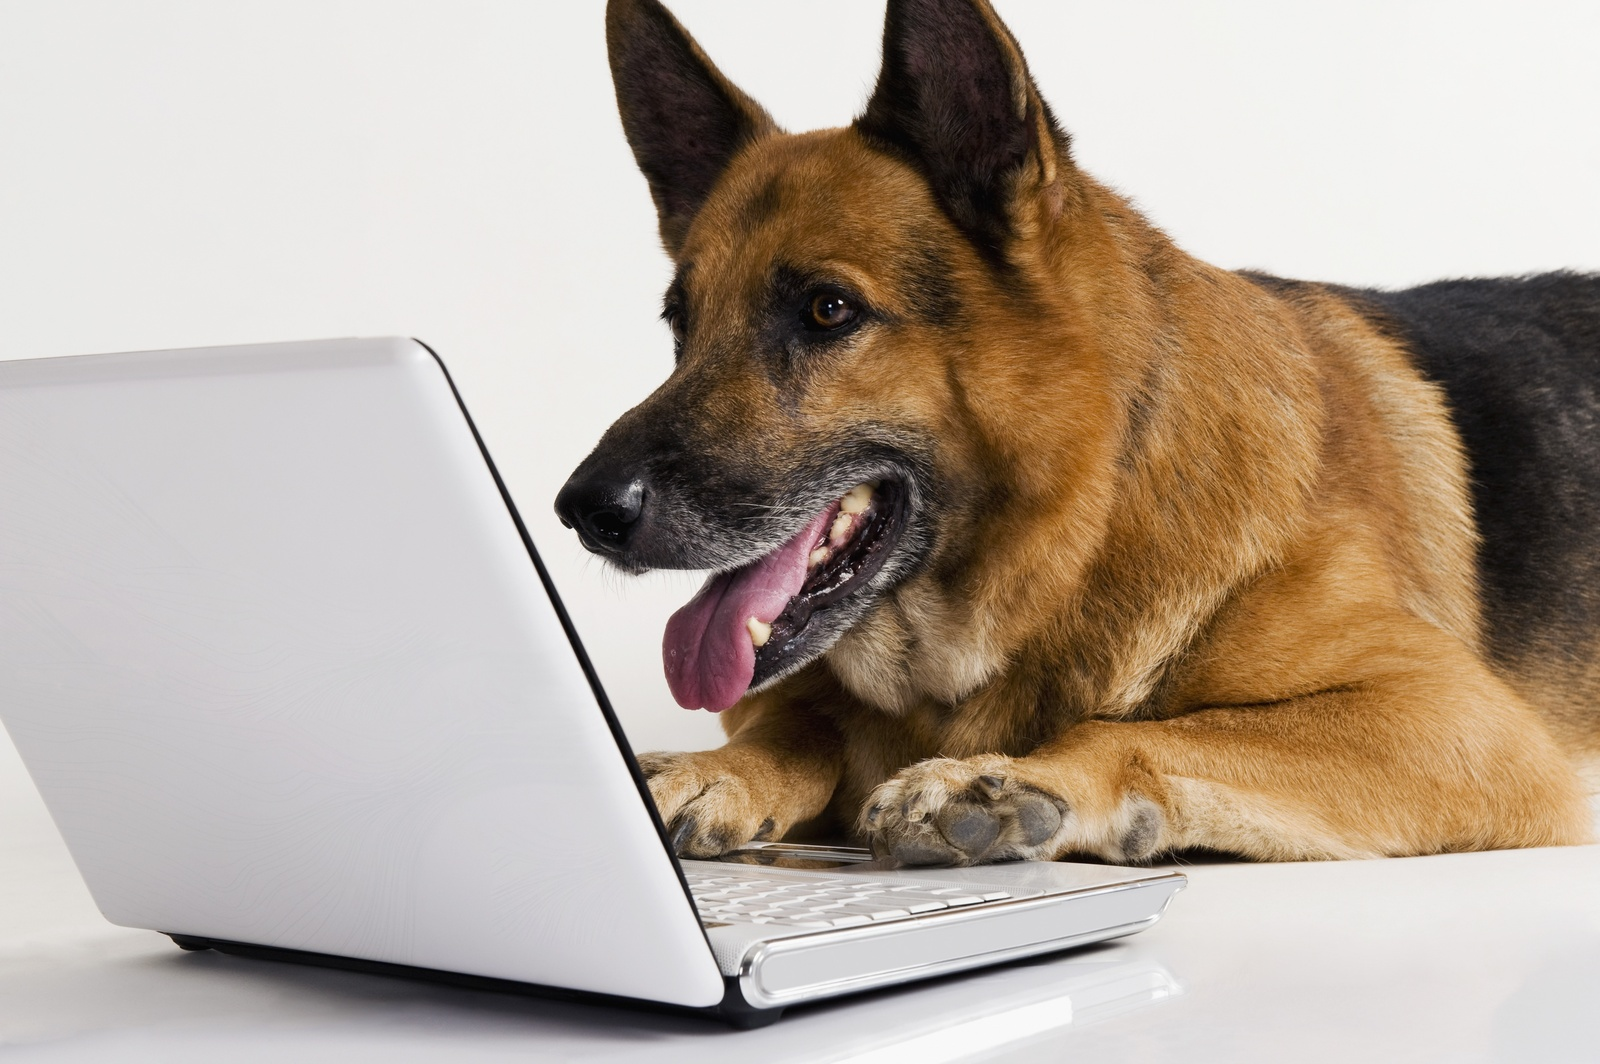 Картинки по запросу Собака с книгой